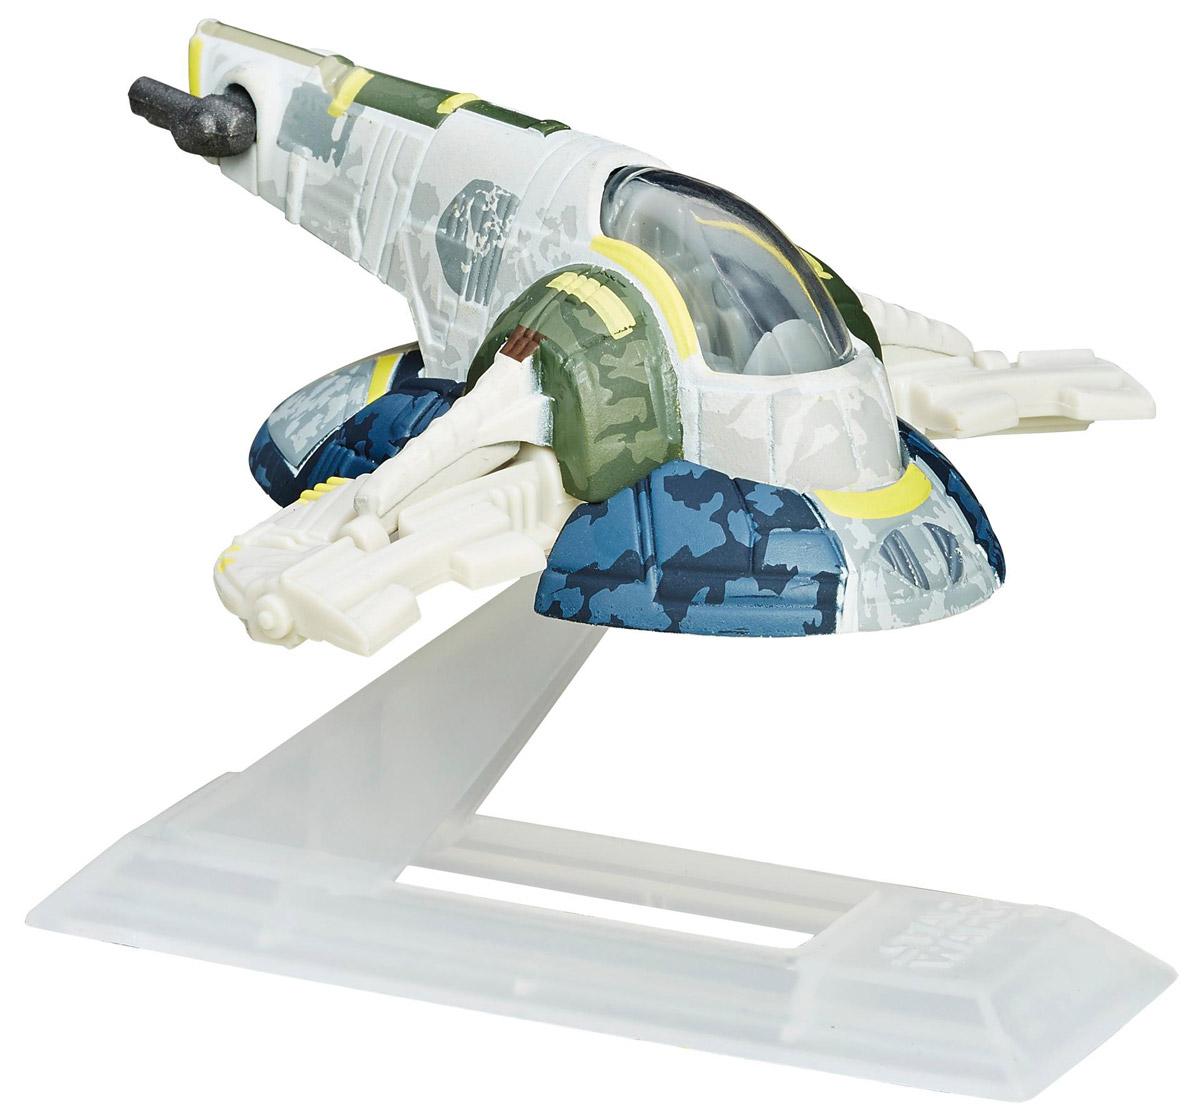 Star Wars Космический корабль Jango Fetts Slave I ( B3929EU4_B6595 )